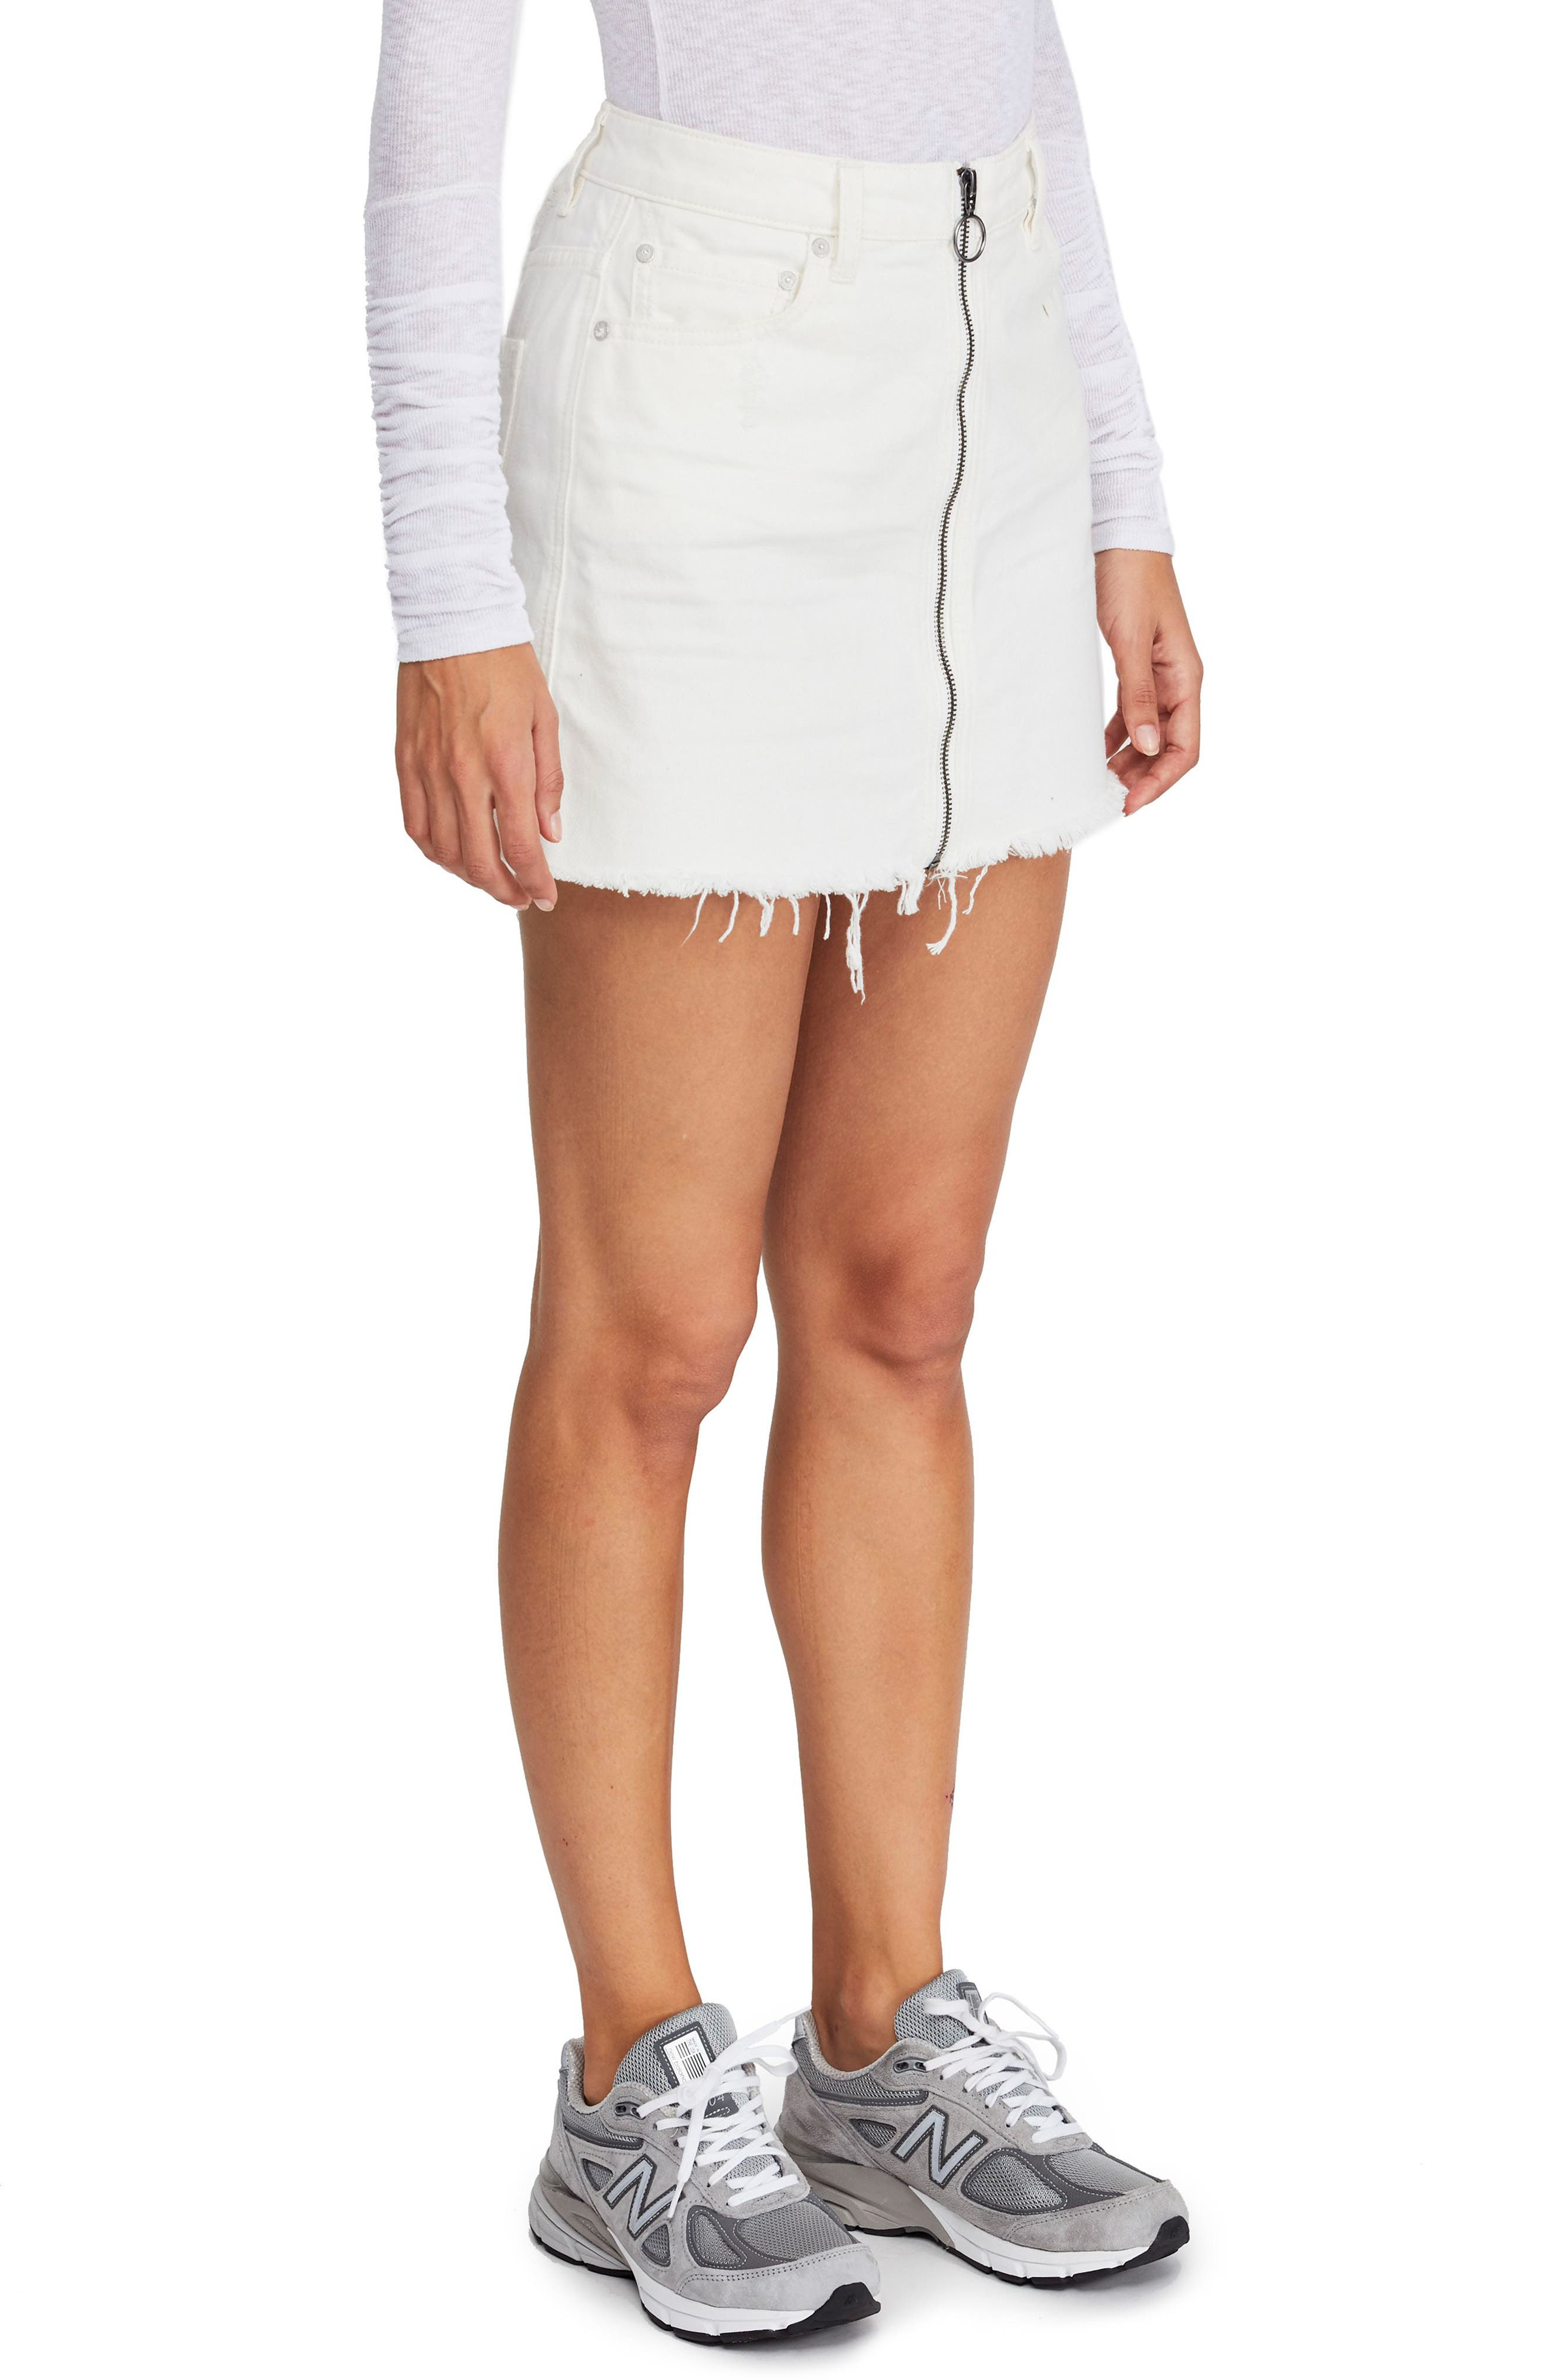 FREE PEOPLE Zip It Up Denim Miniskirt, Main, color, WHITE